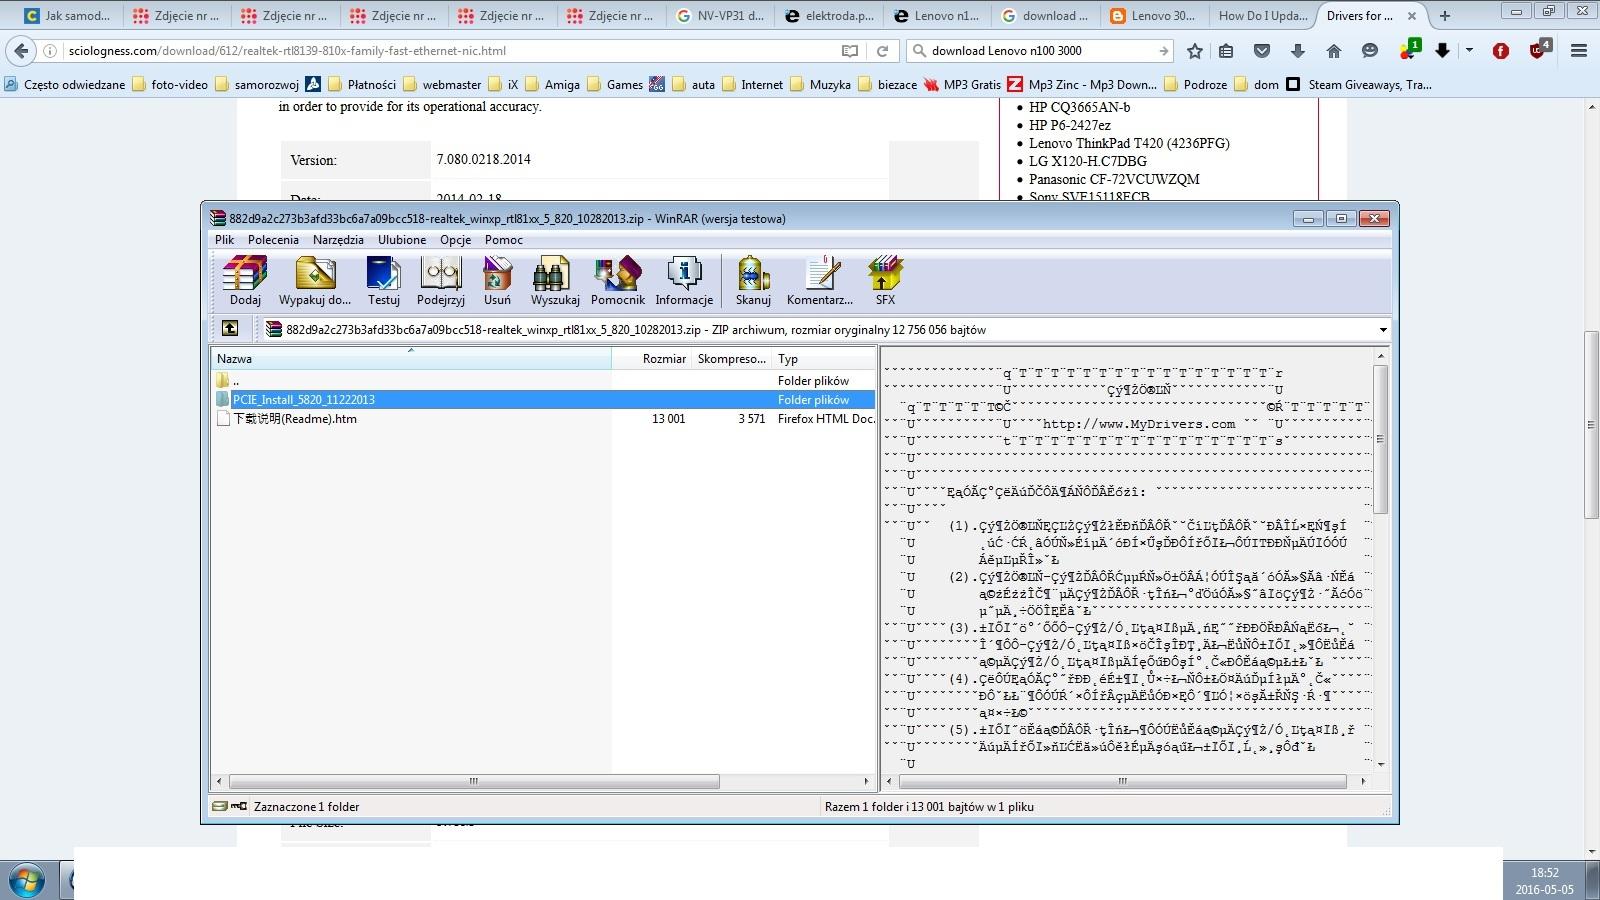 click lenovo 3000 c200 drivers for windows xp it's